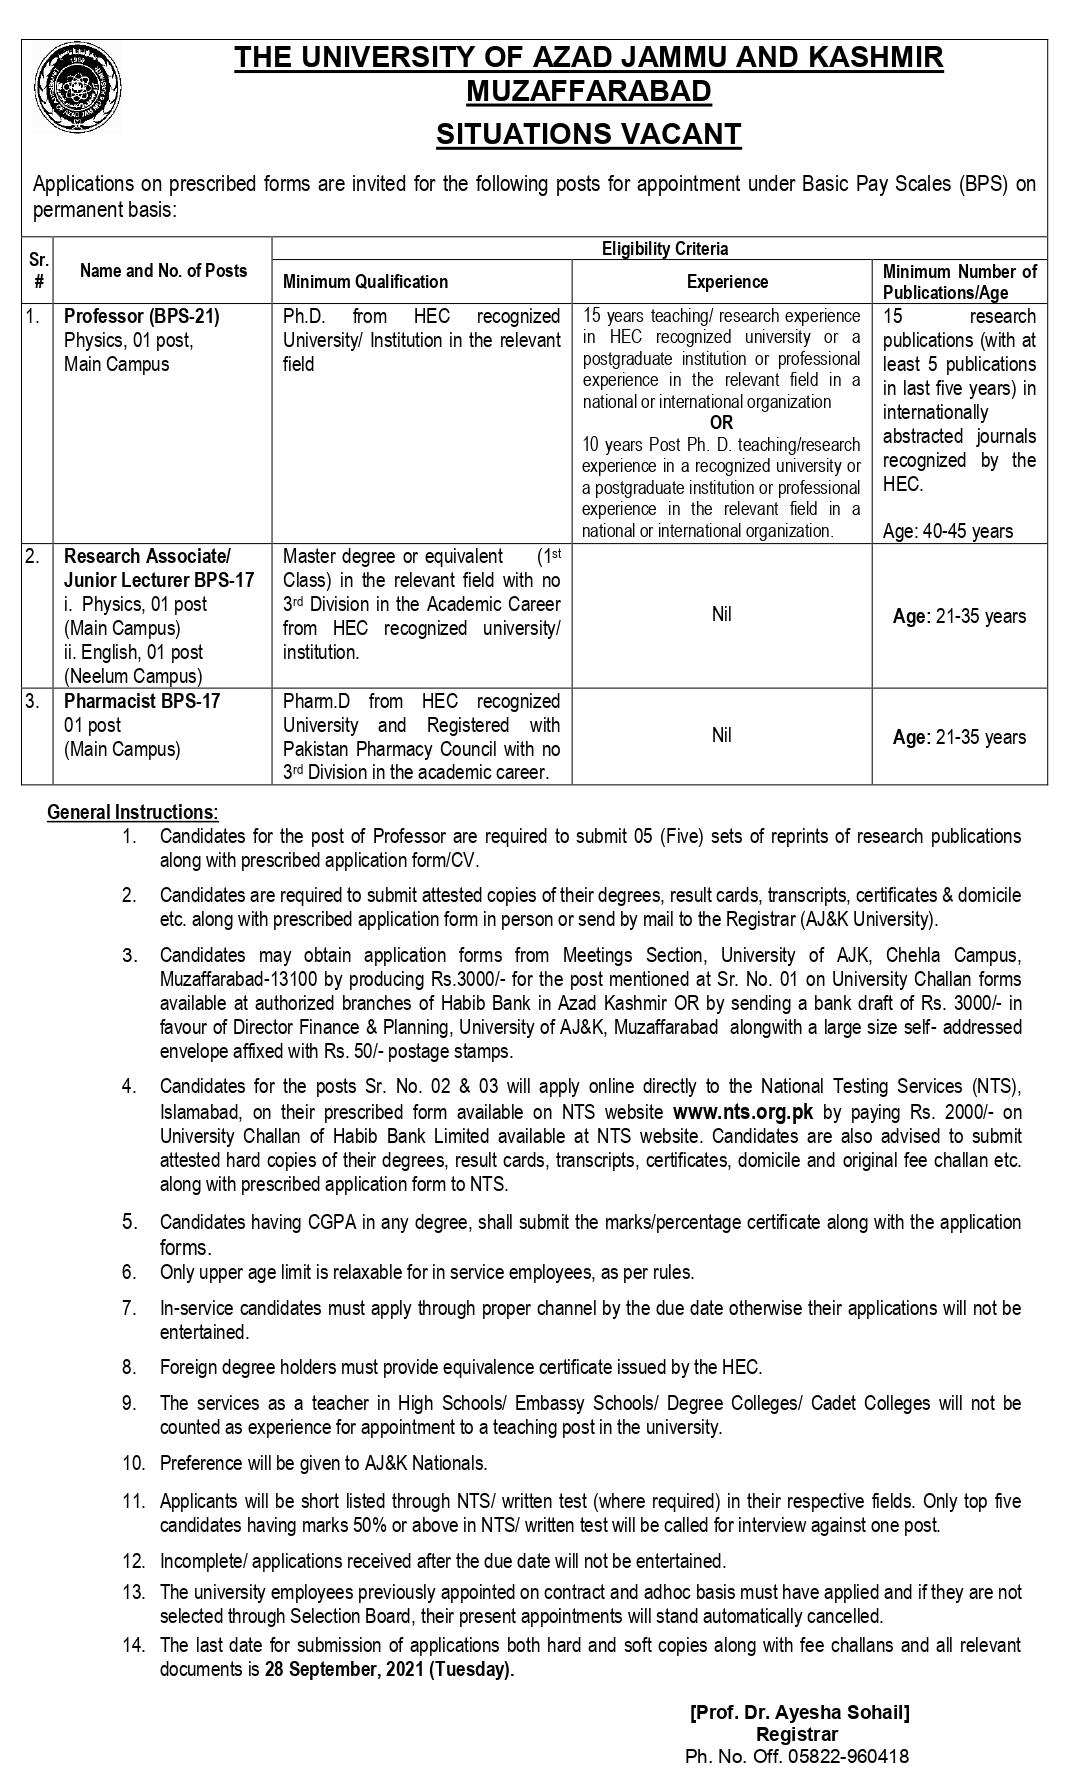 University of Azad Jammu And Kashmir Muzaffarabad NTS Jobs 2021 Apply Online